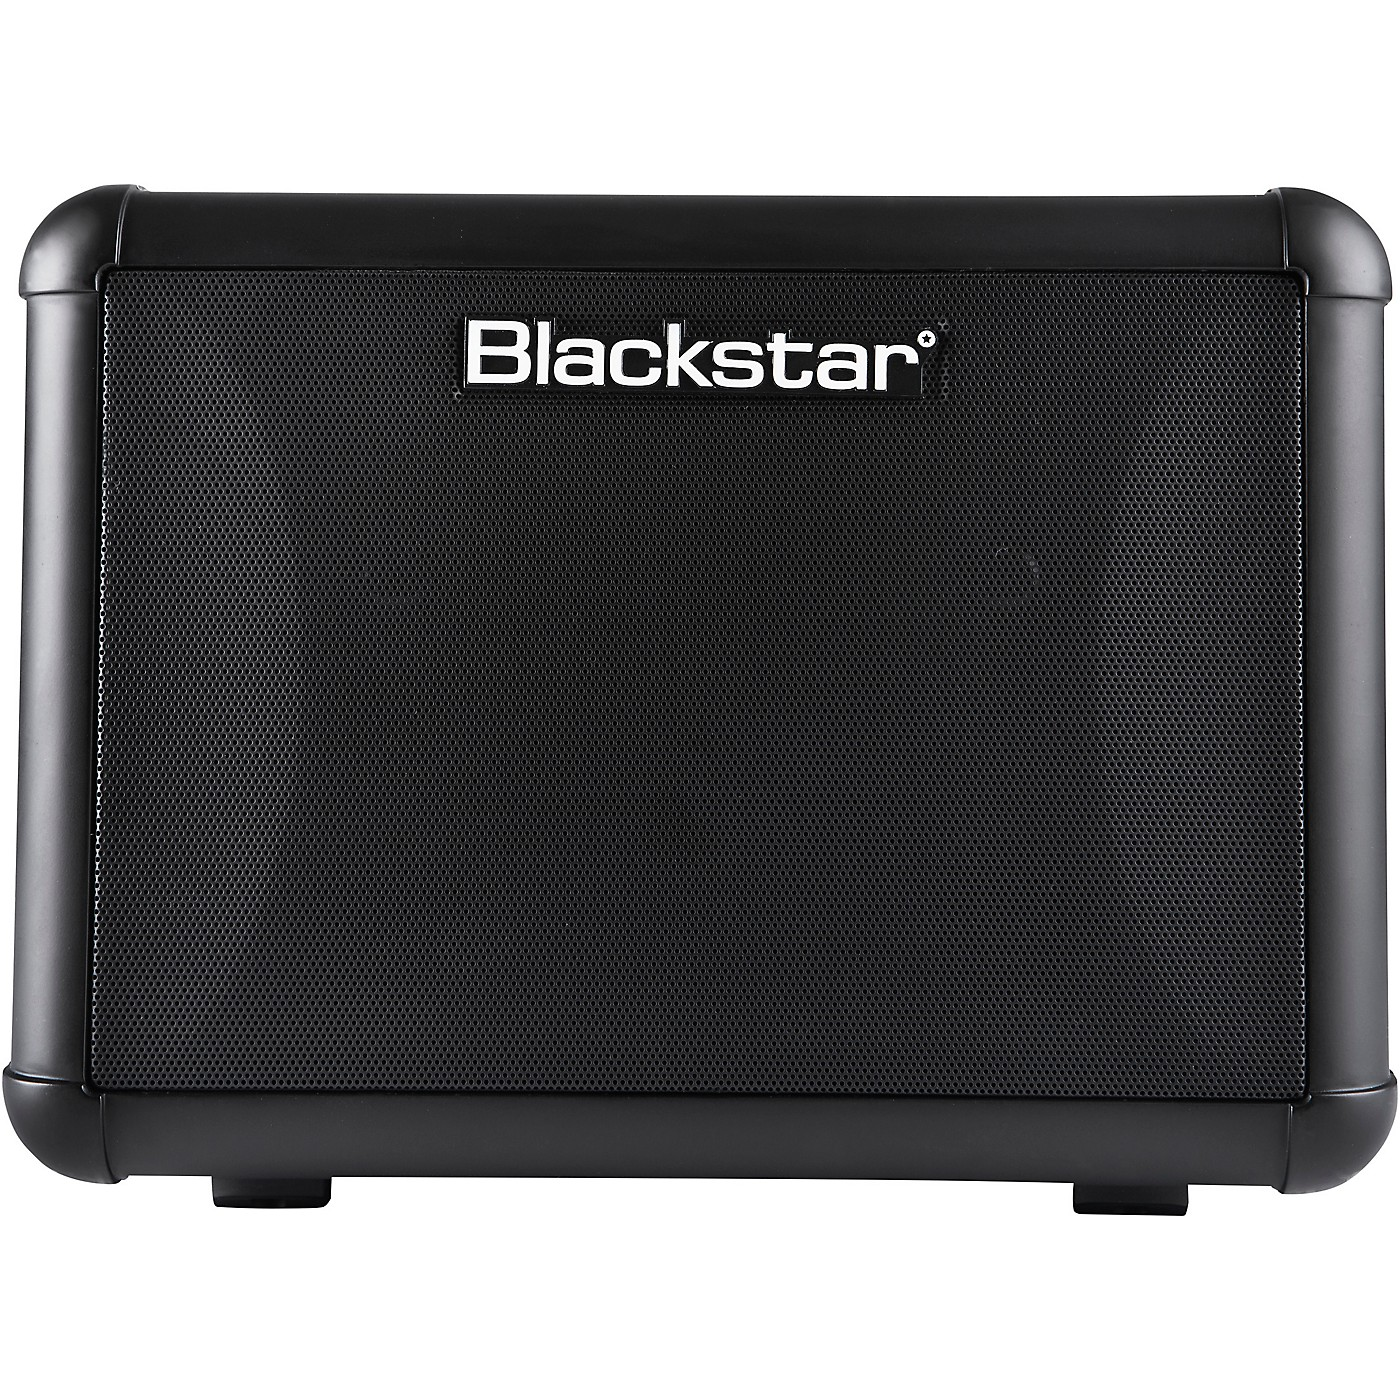 Blackstar Super Fly Act 12W 2x3